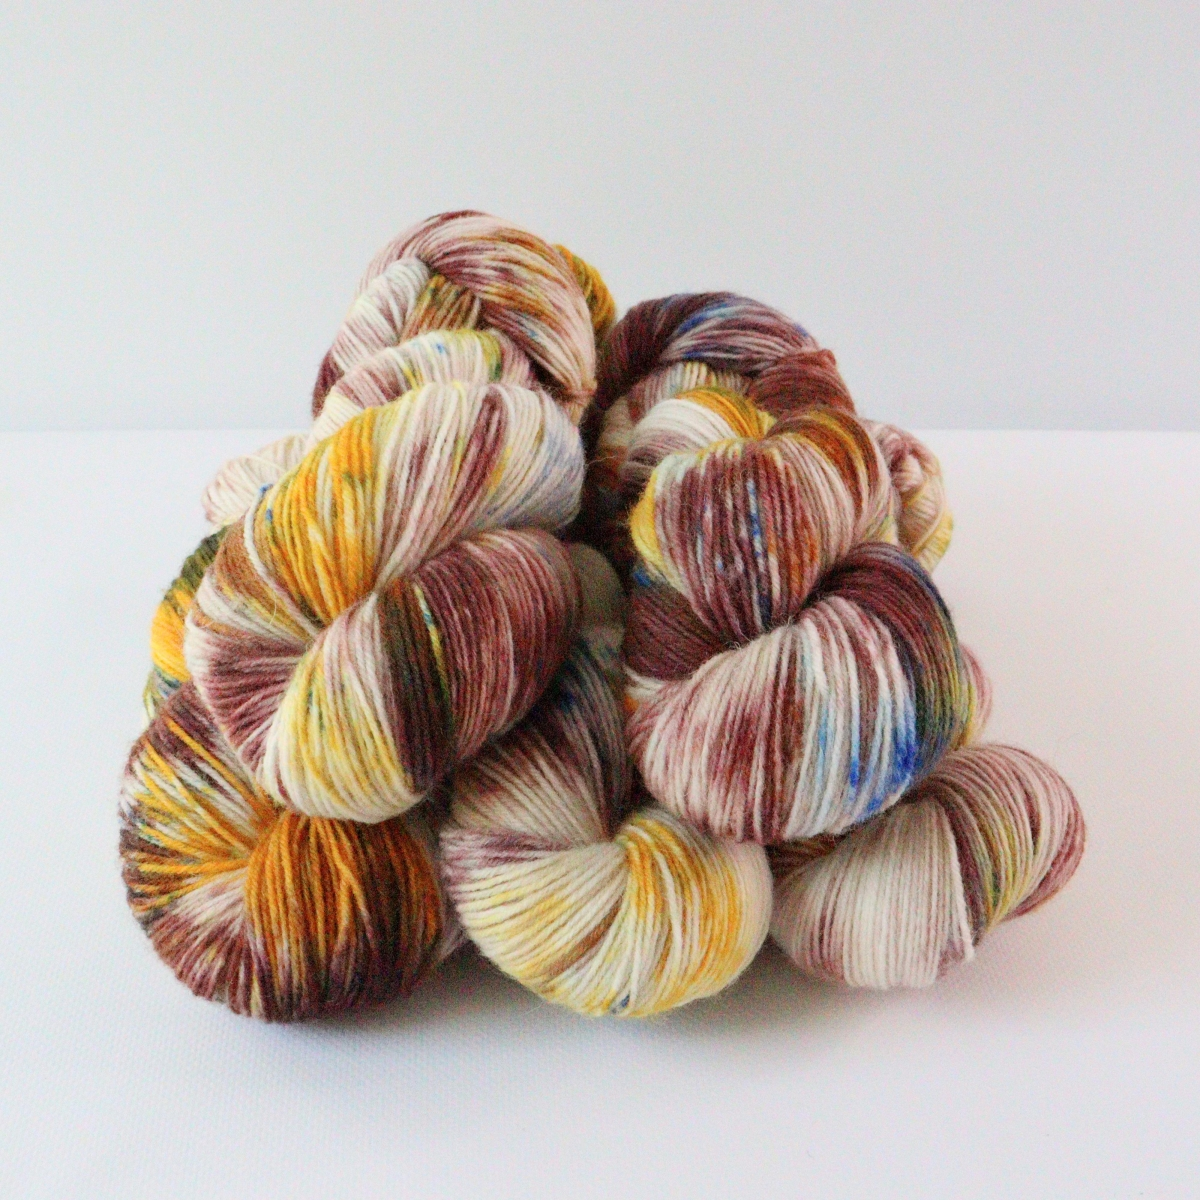 woodico.pro hand dyed yarn 089 1200x1200 - Hand dyed yarn / 089